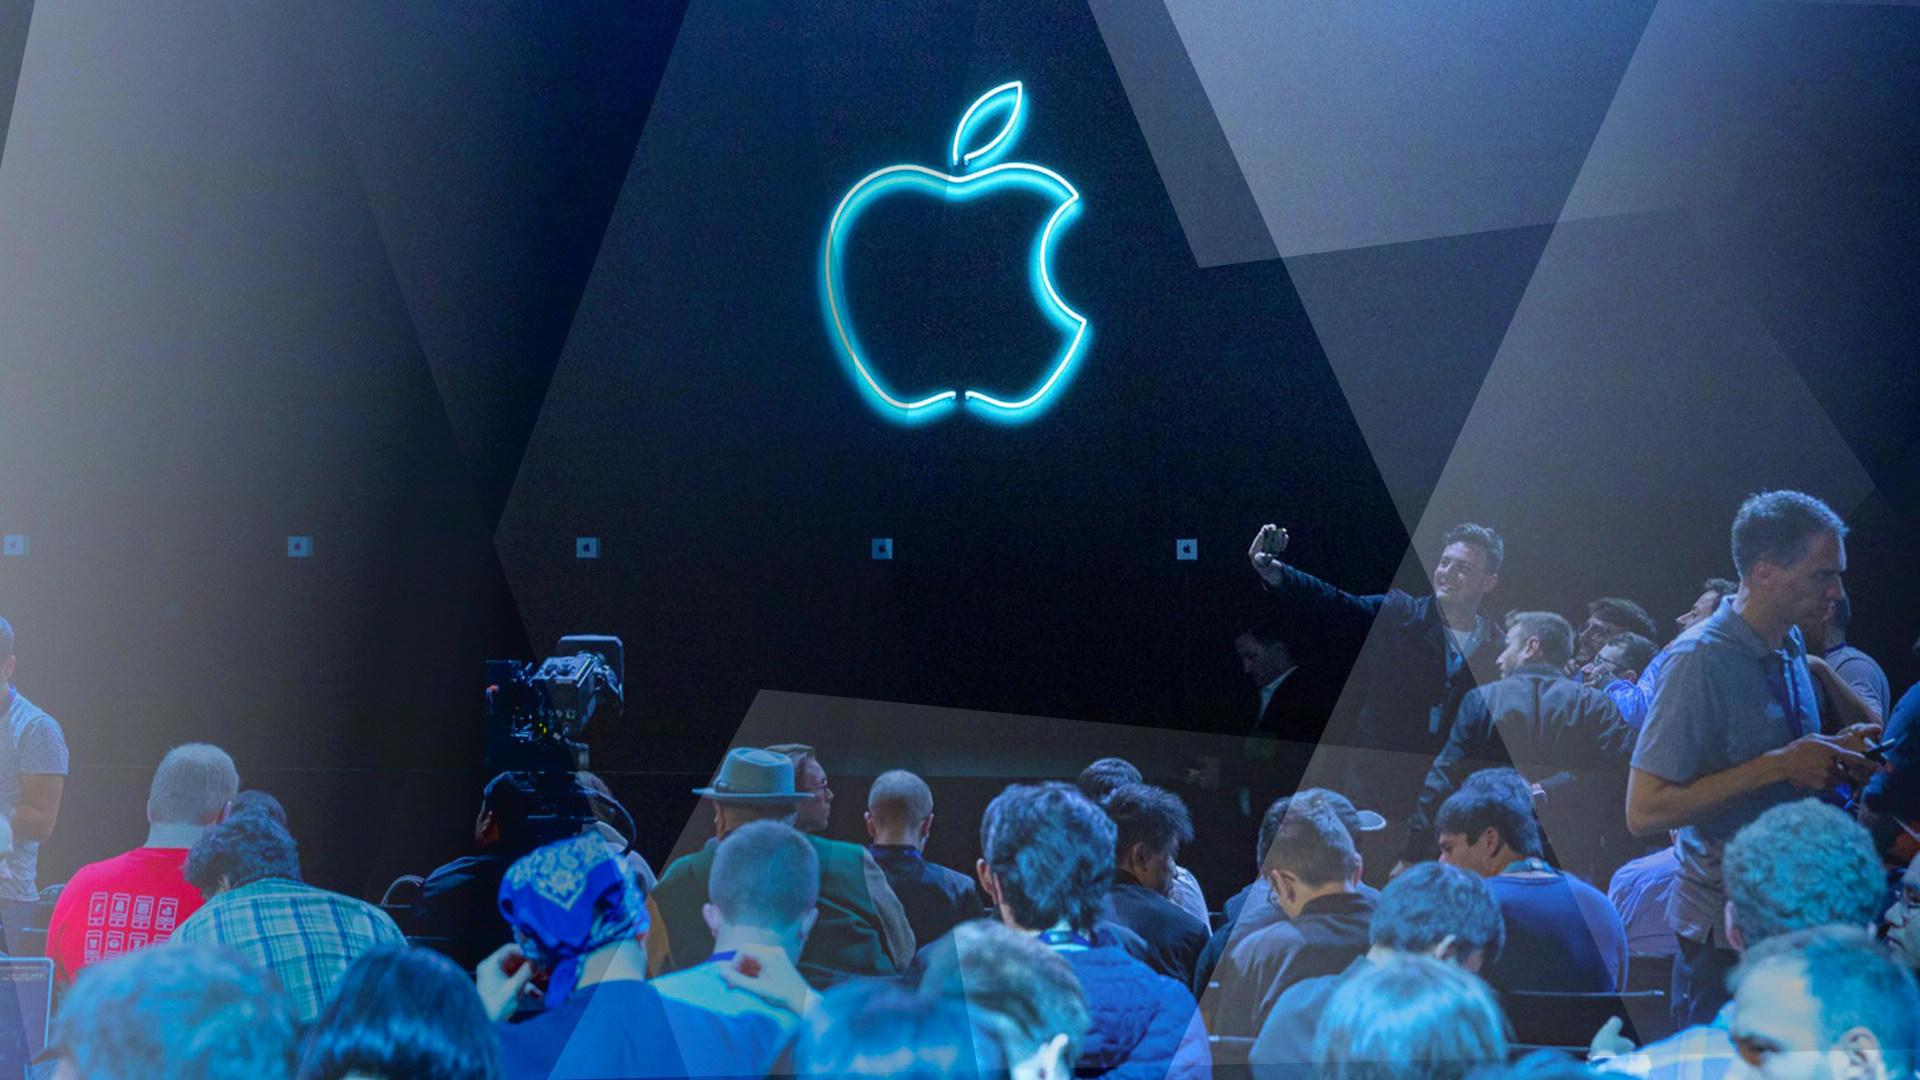 Apple, Mac, Event, Online, Keynote, Apple Keynote, One more thing